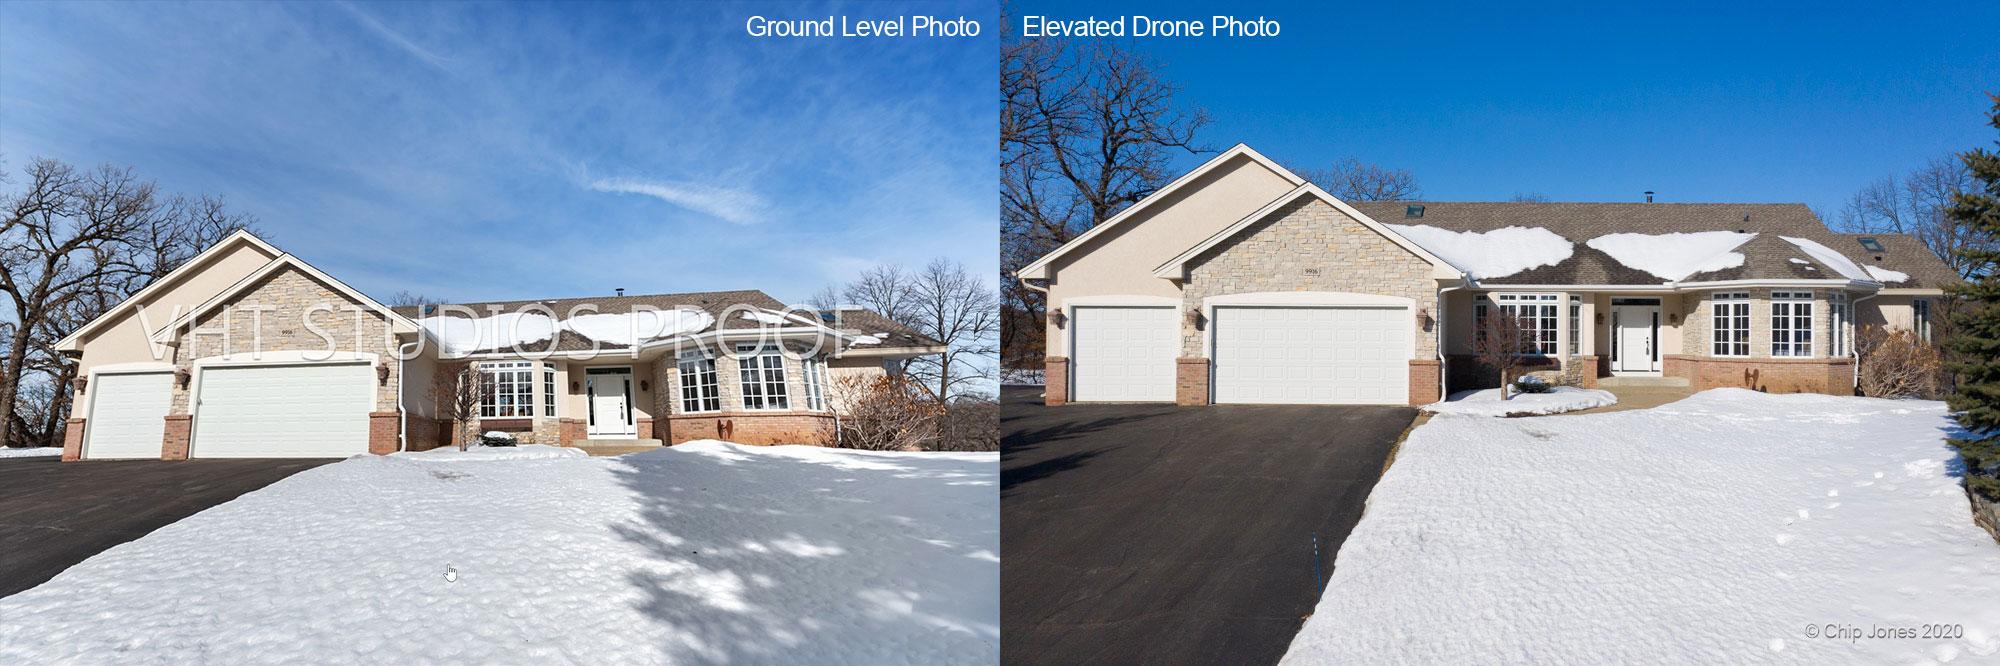 Ground Photo vs Aerial Photo